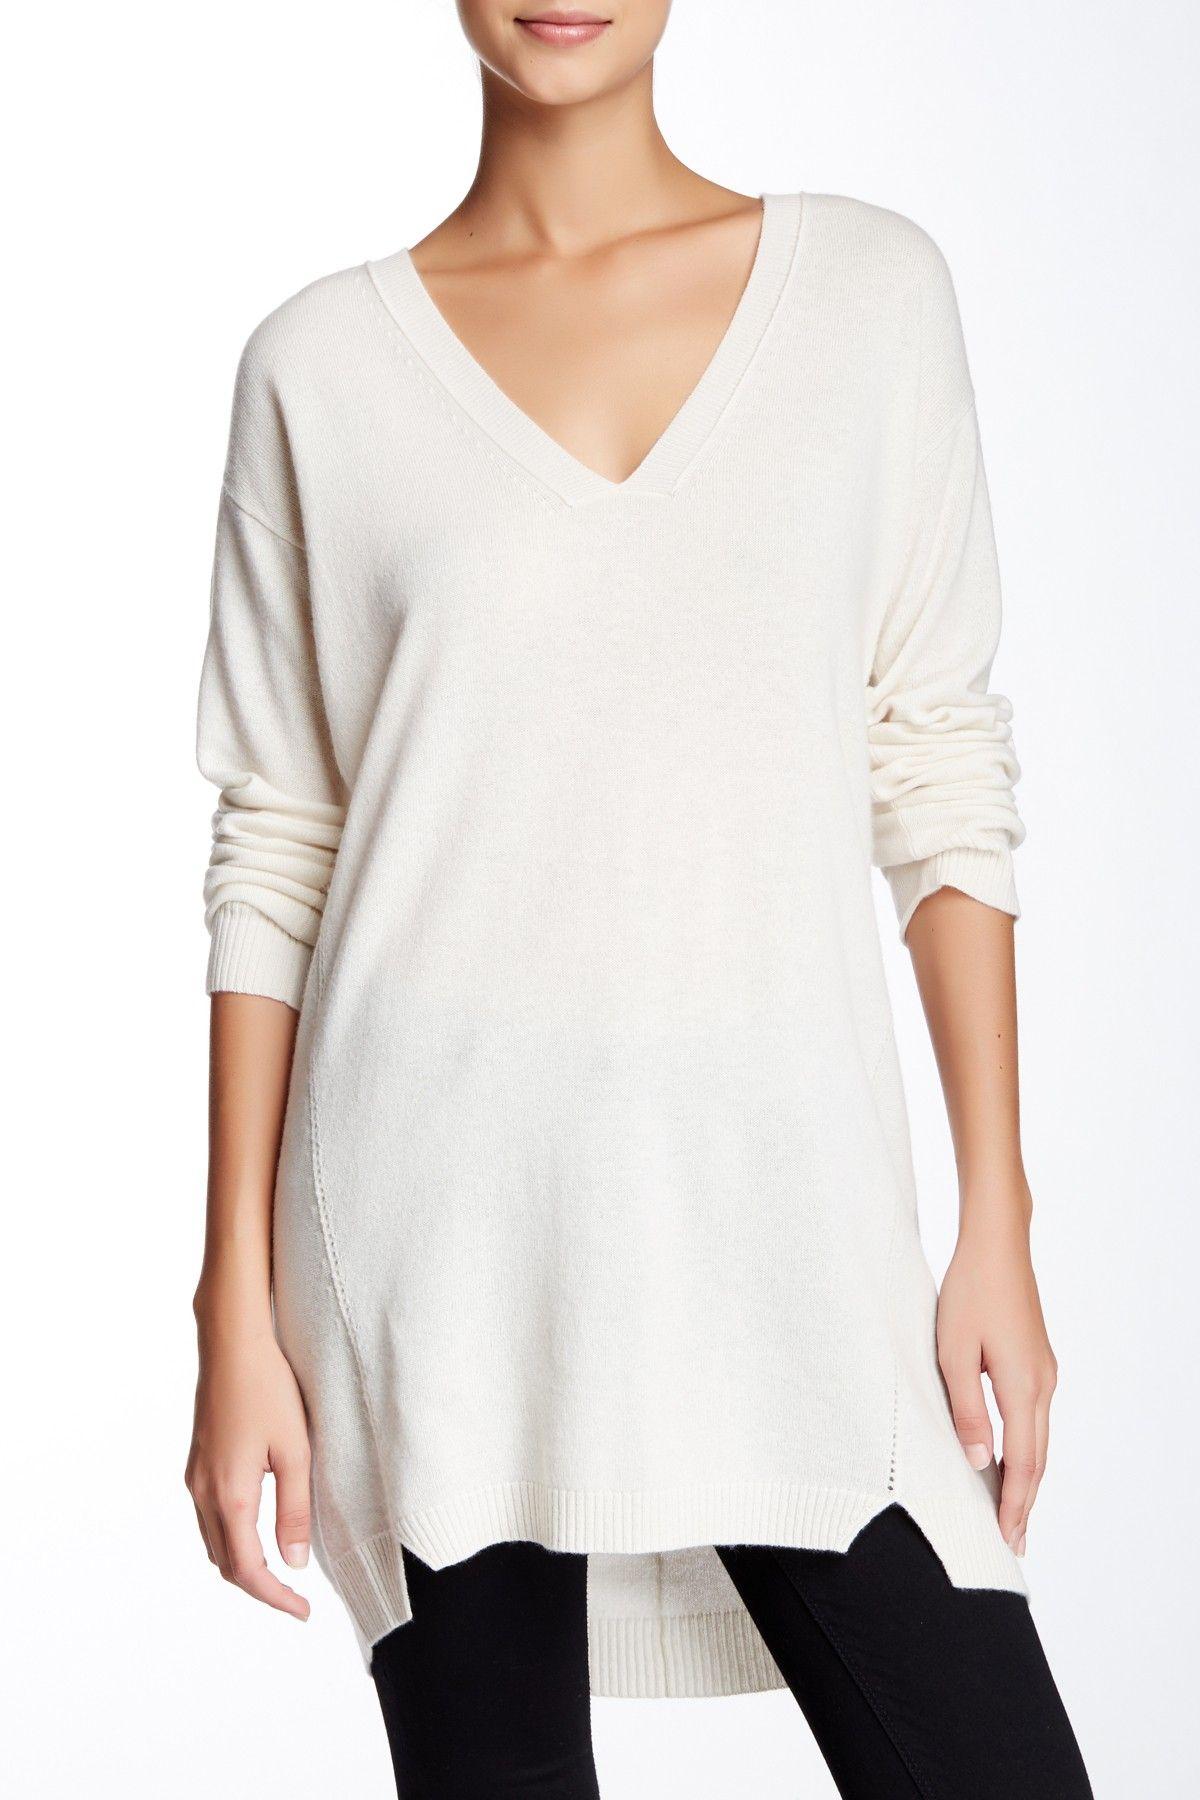 Inhabit | Essential Cashmere Tunic Sweater | Tunic sweater ...